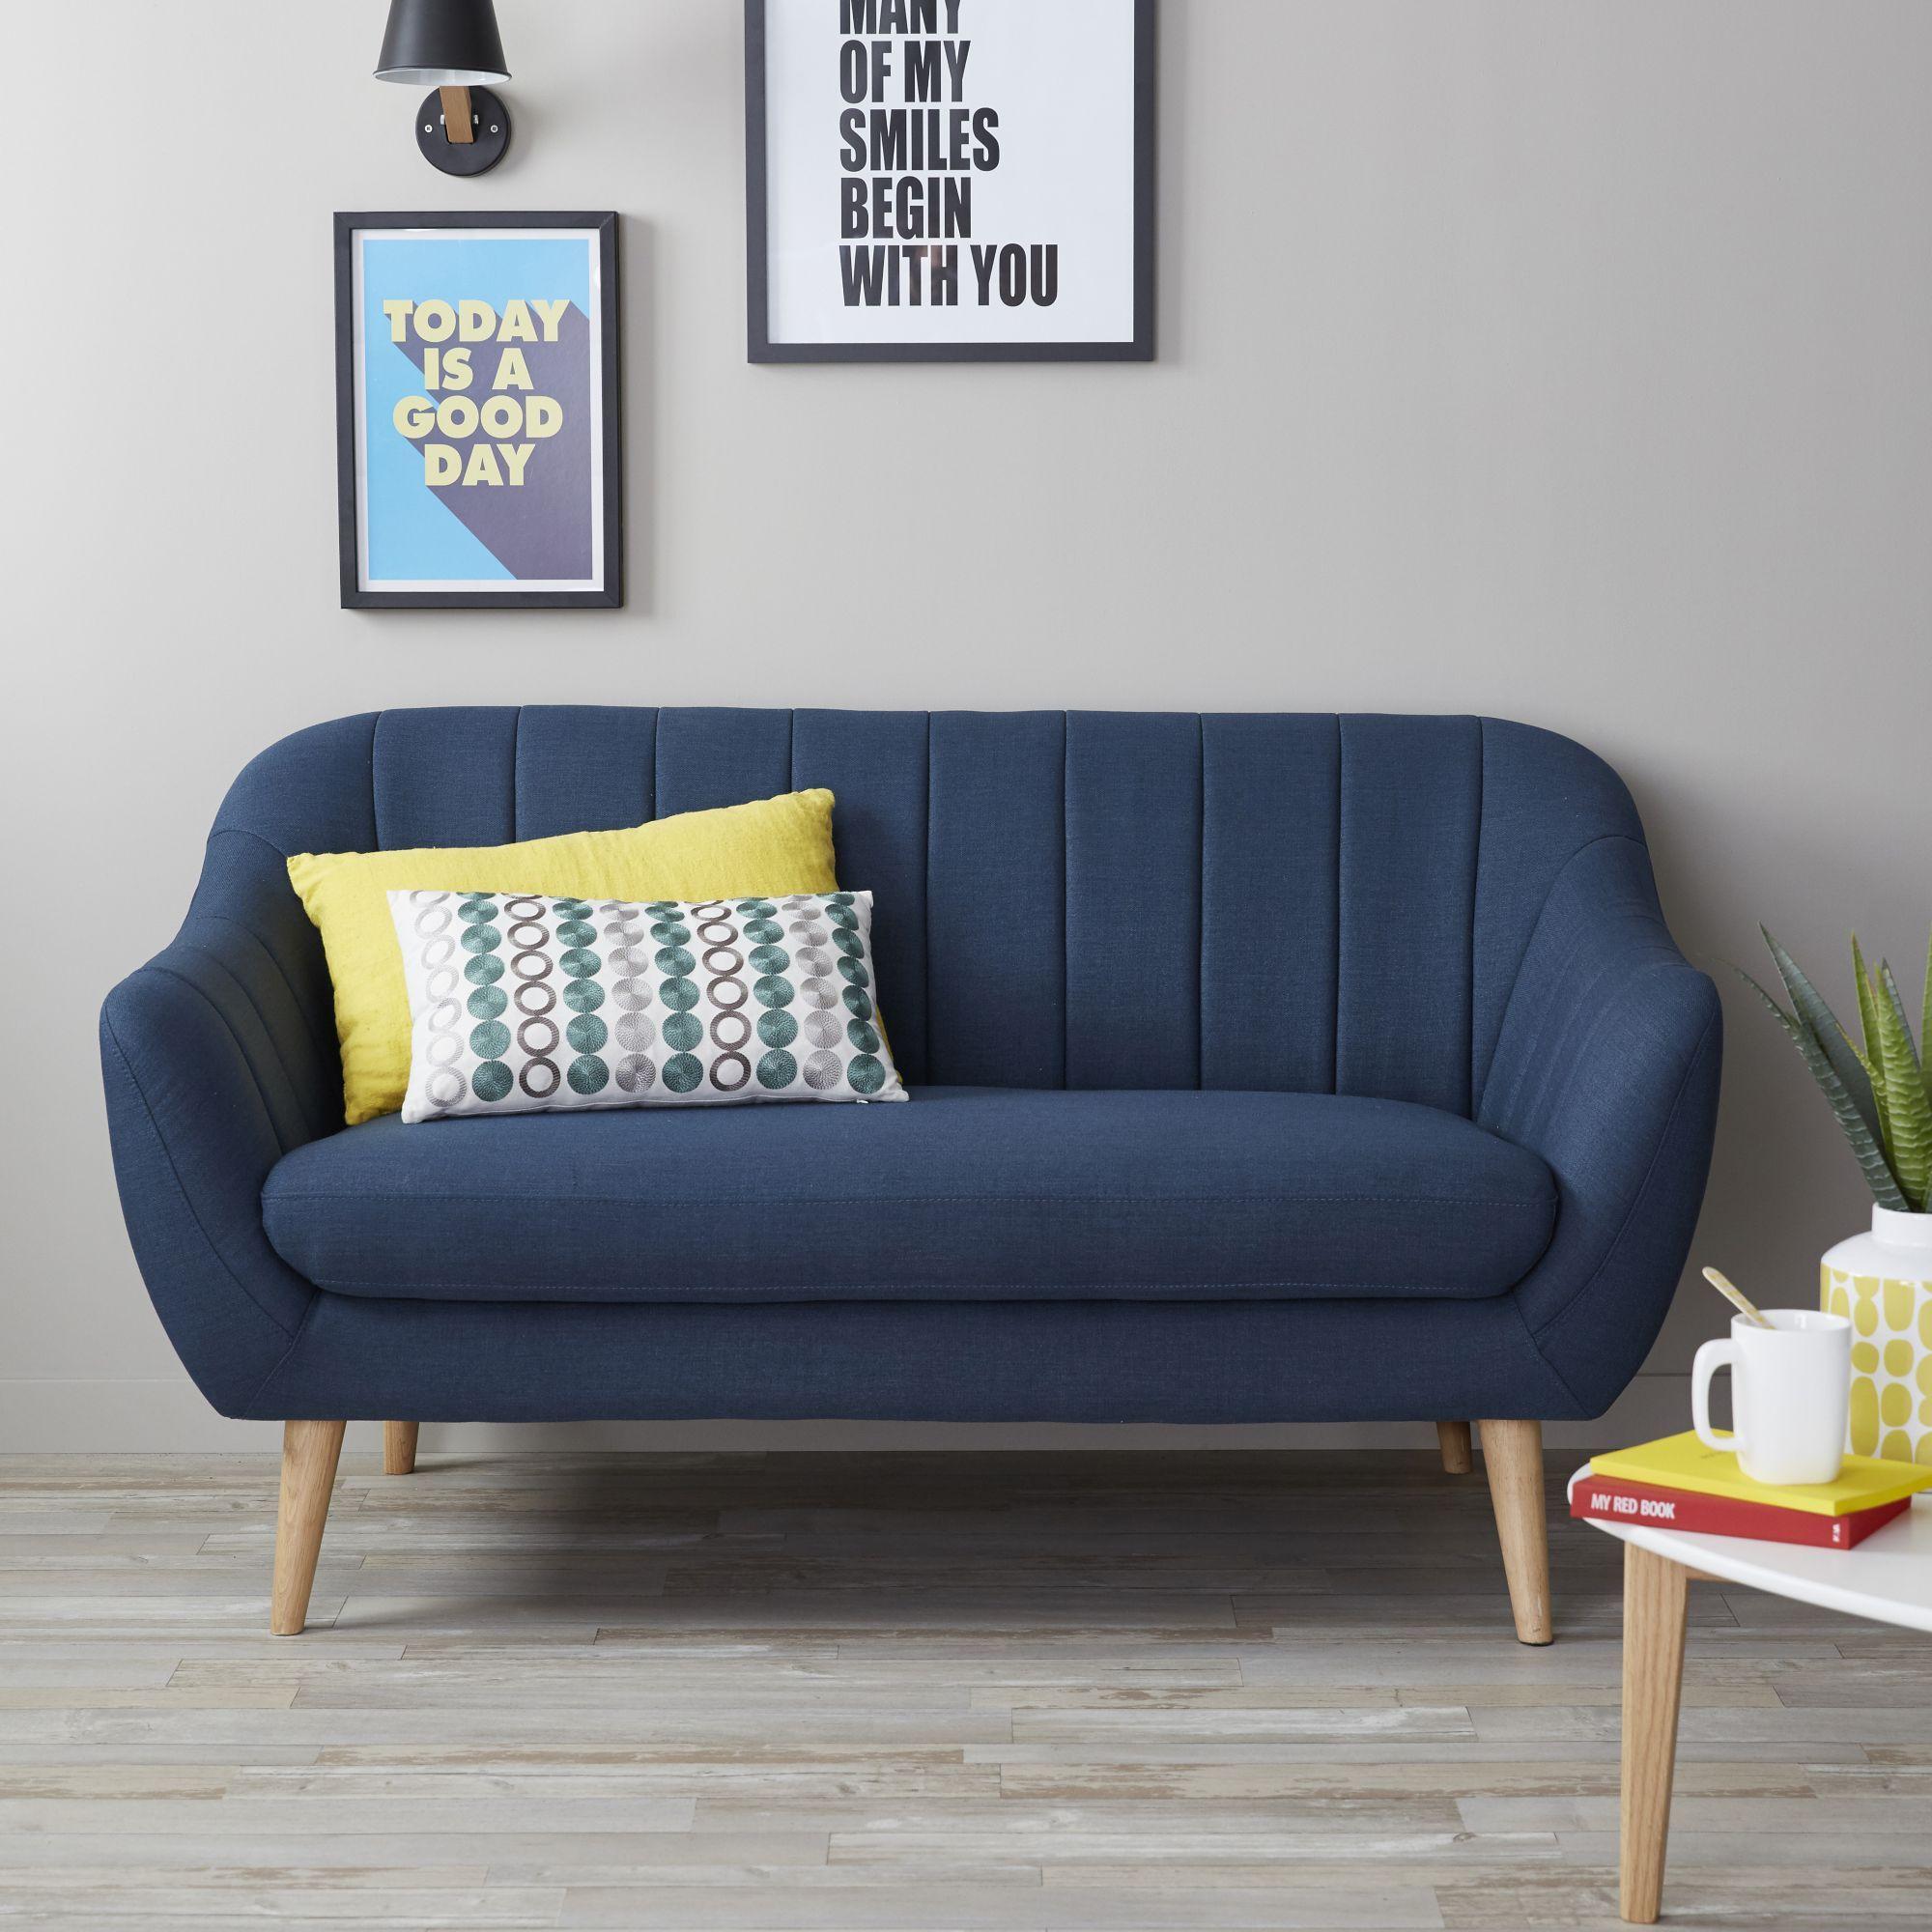 gros coup de coeur pour ce canap alin a shell. Black Bedroom Furniture Sets. Home Design Ideas